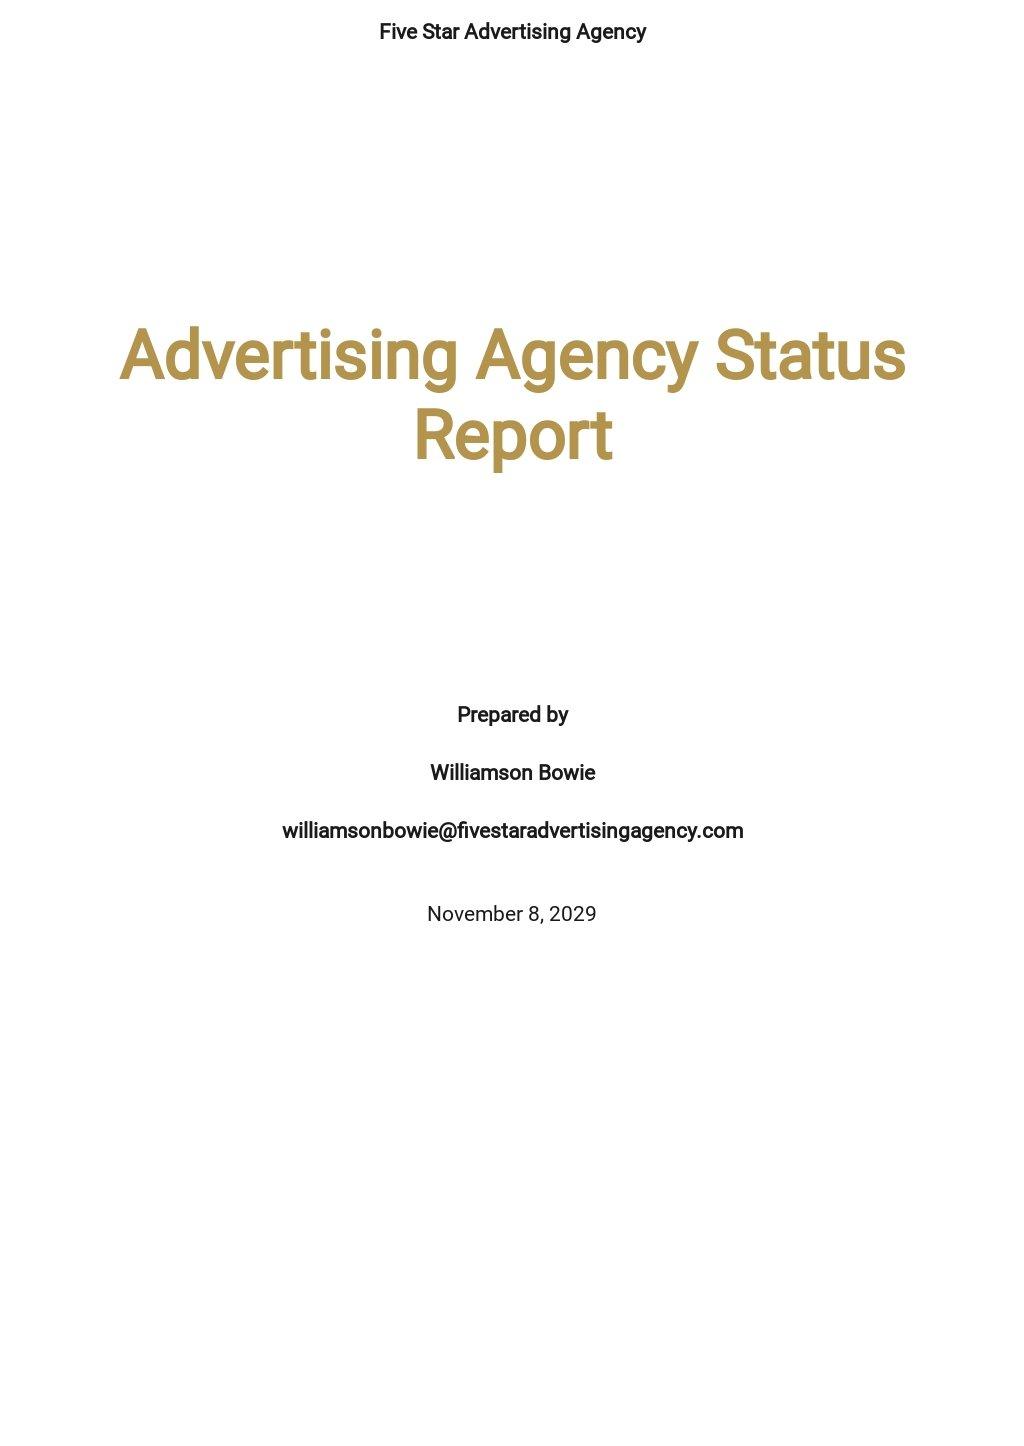 Advertising Agency Status Report Template.jpe